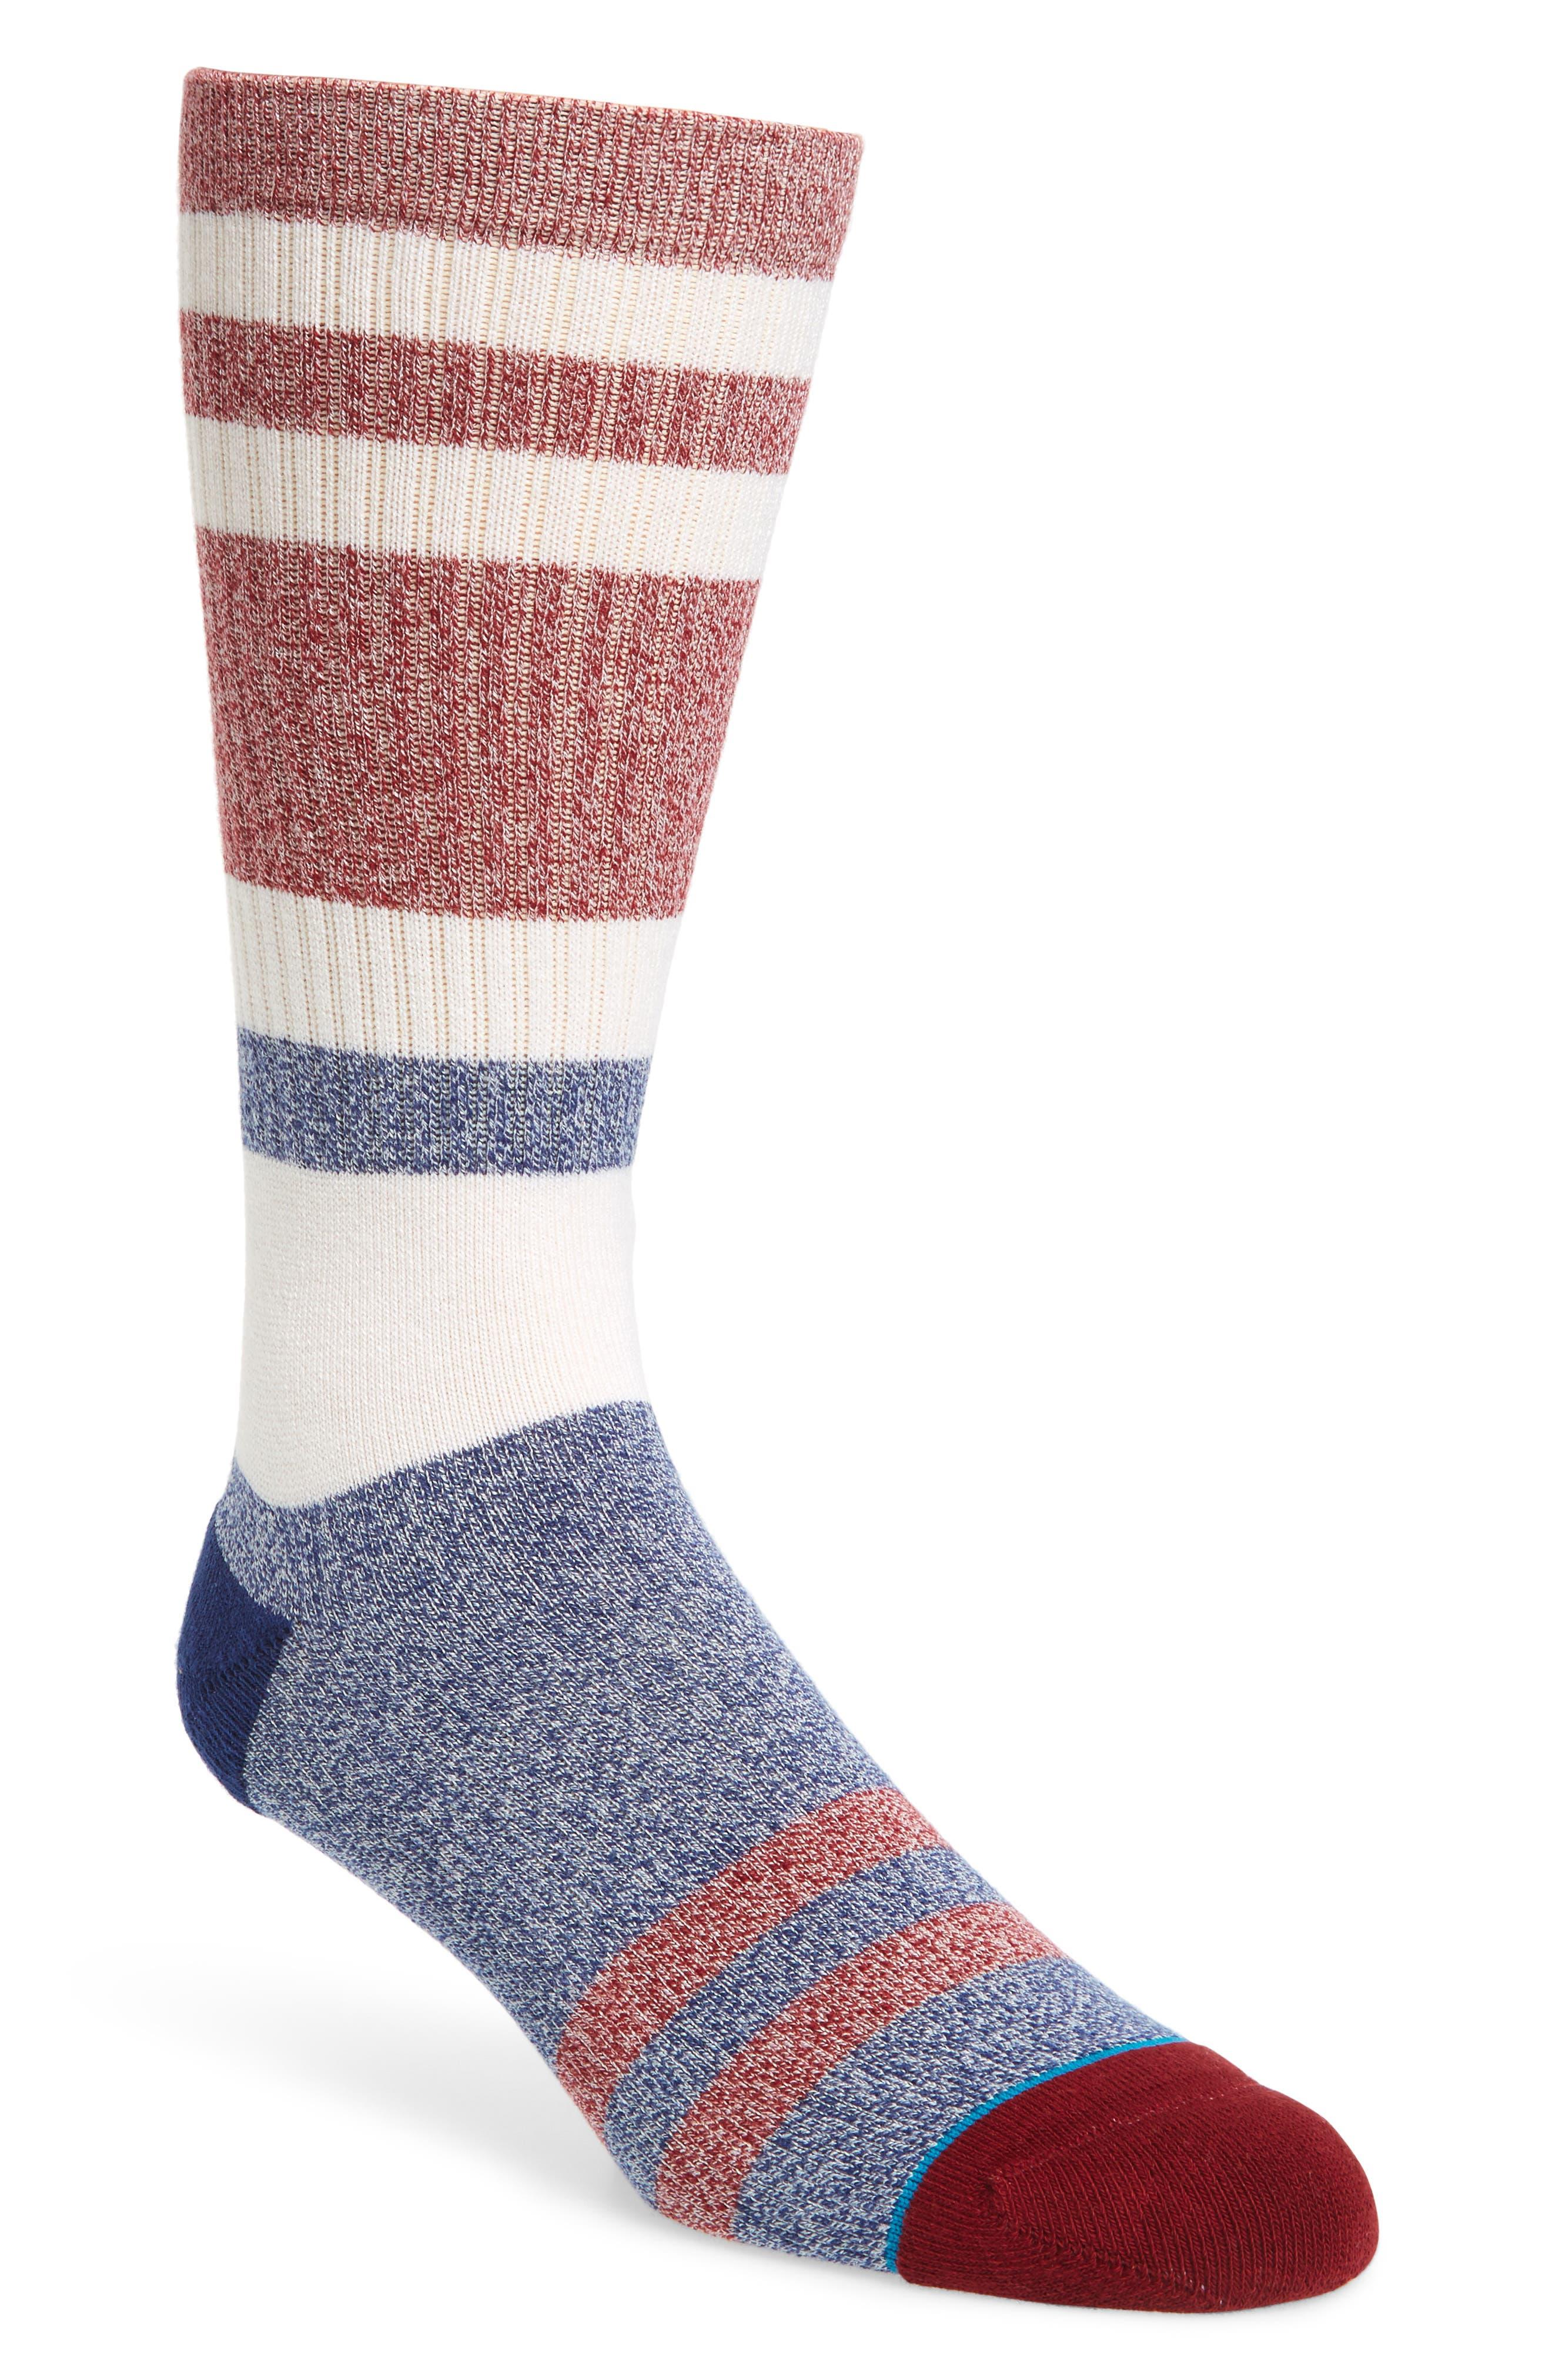 Robinsen Crew Socks,                         Main,                         color, 600